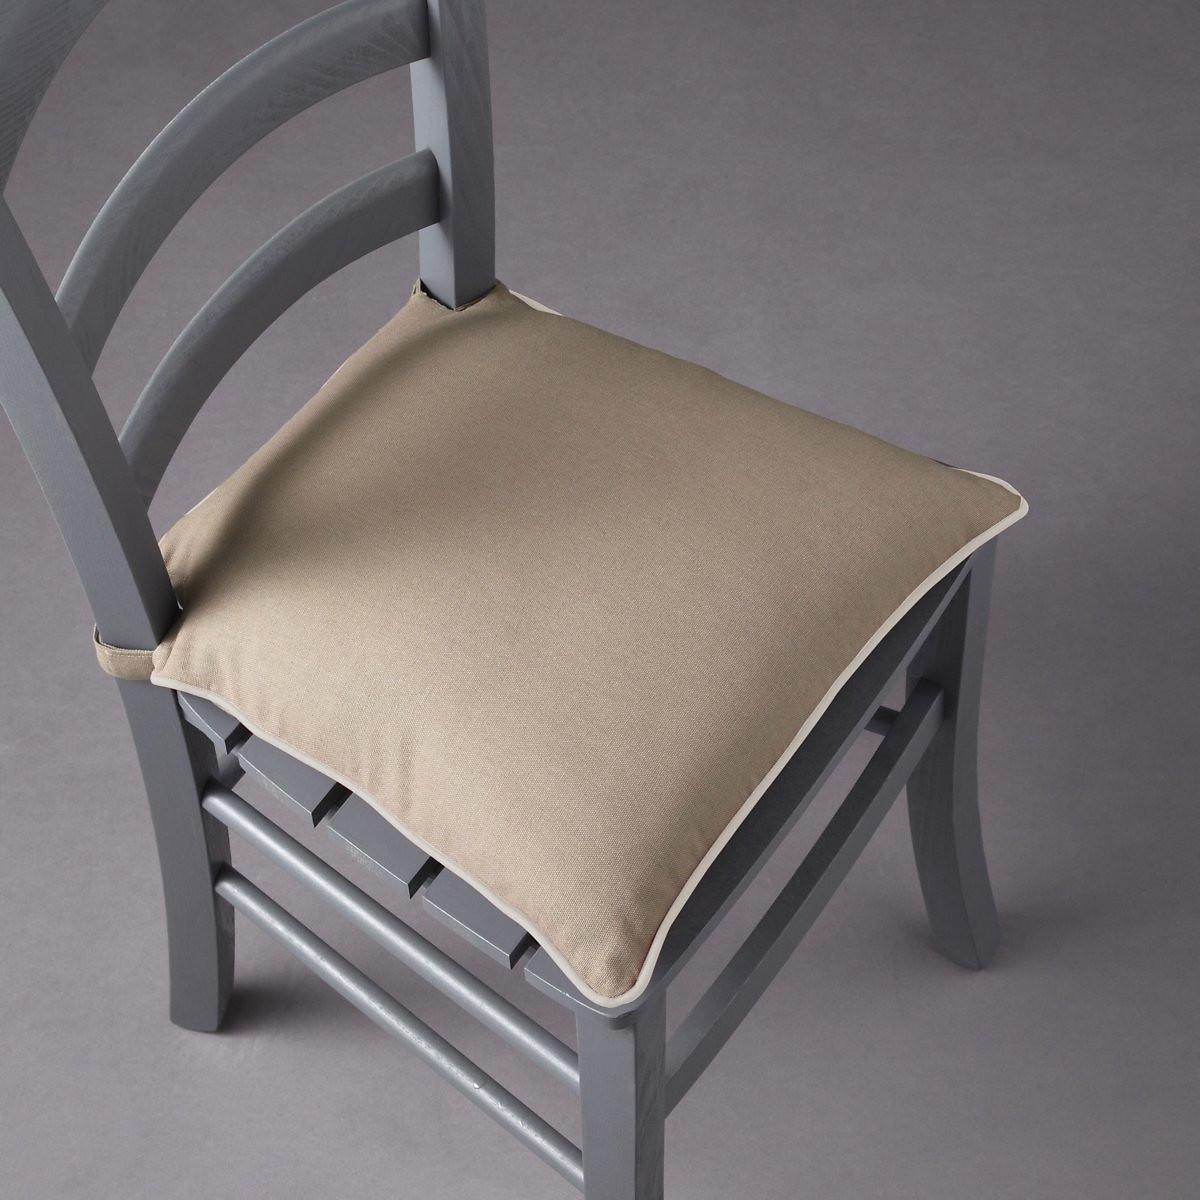 Подушка LaRedoute На стул BRIDGY единый размер каштановый